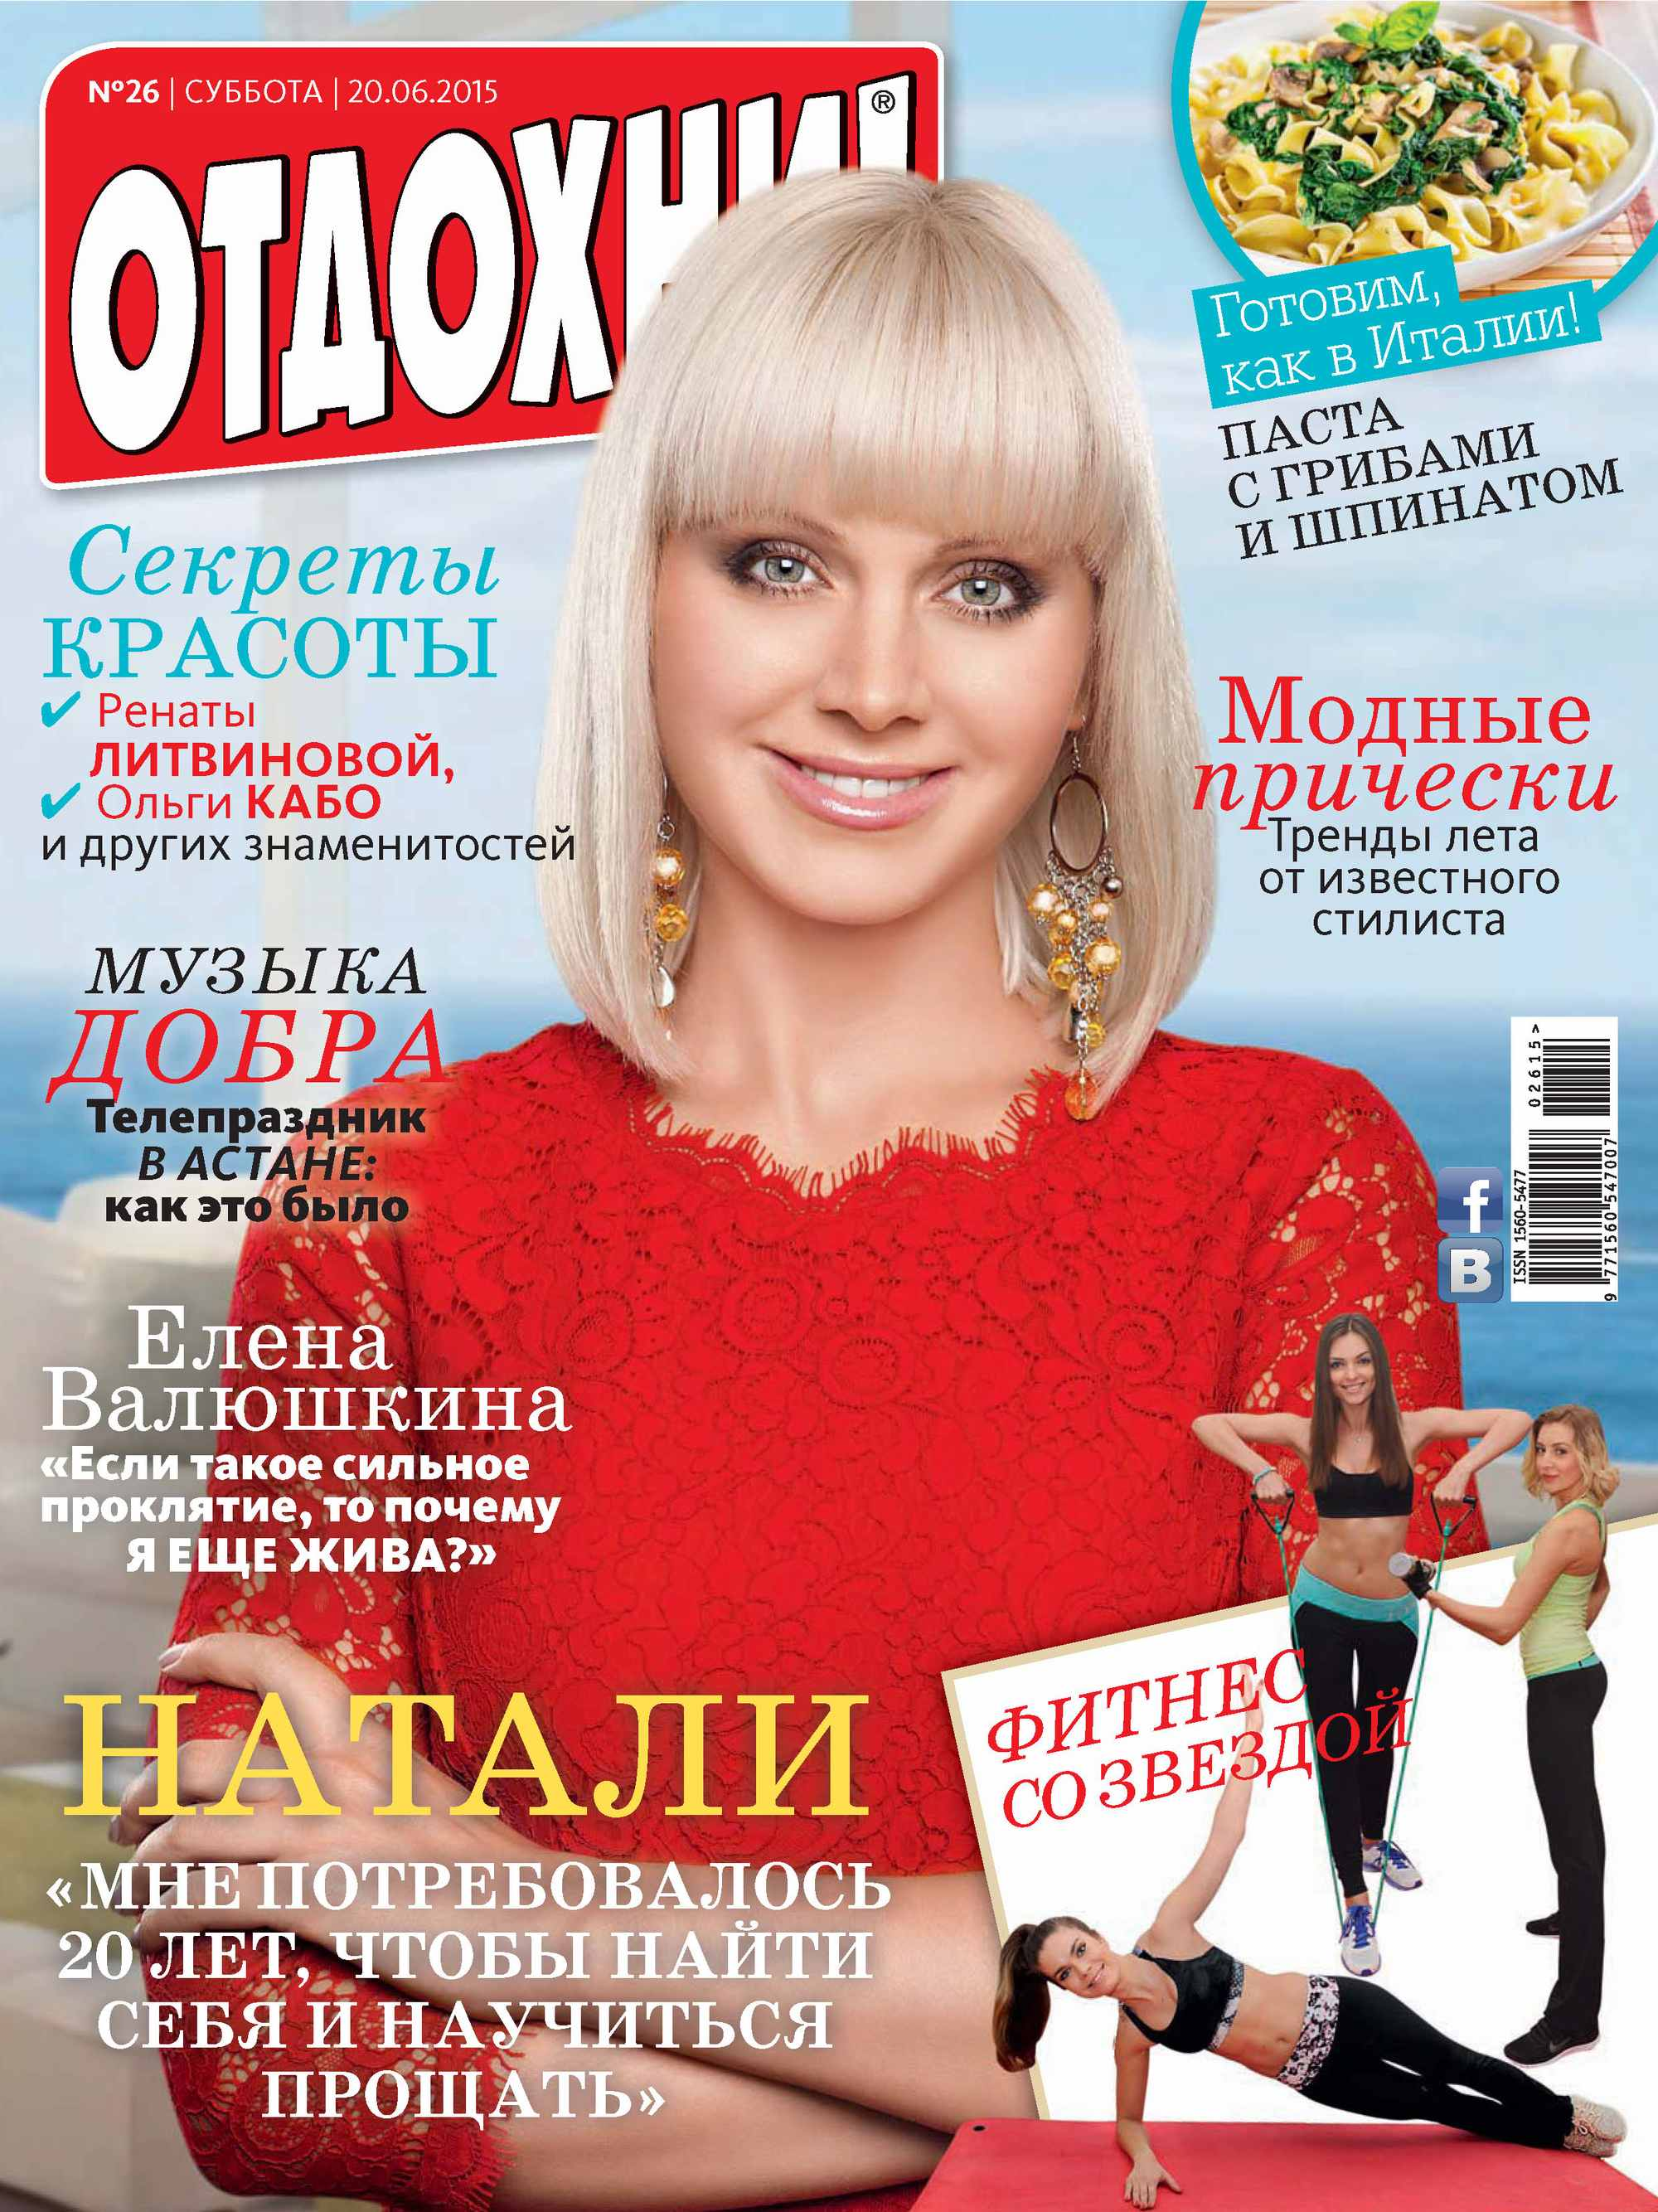 ИД «Бурда» Журнал «Отдохни!» №26/2015 ид бурда журнал отдохни 30 2015